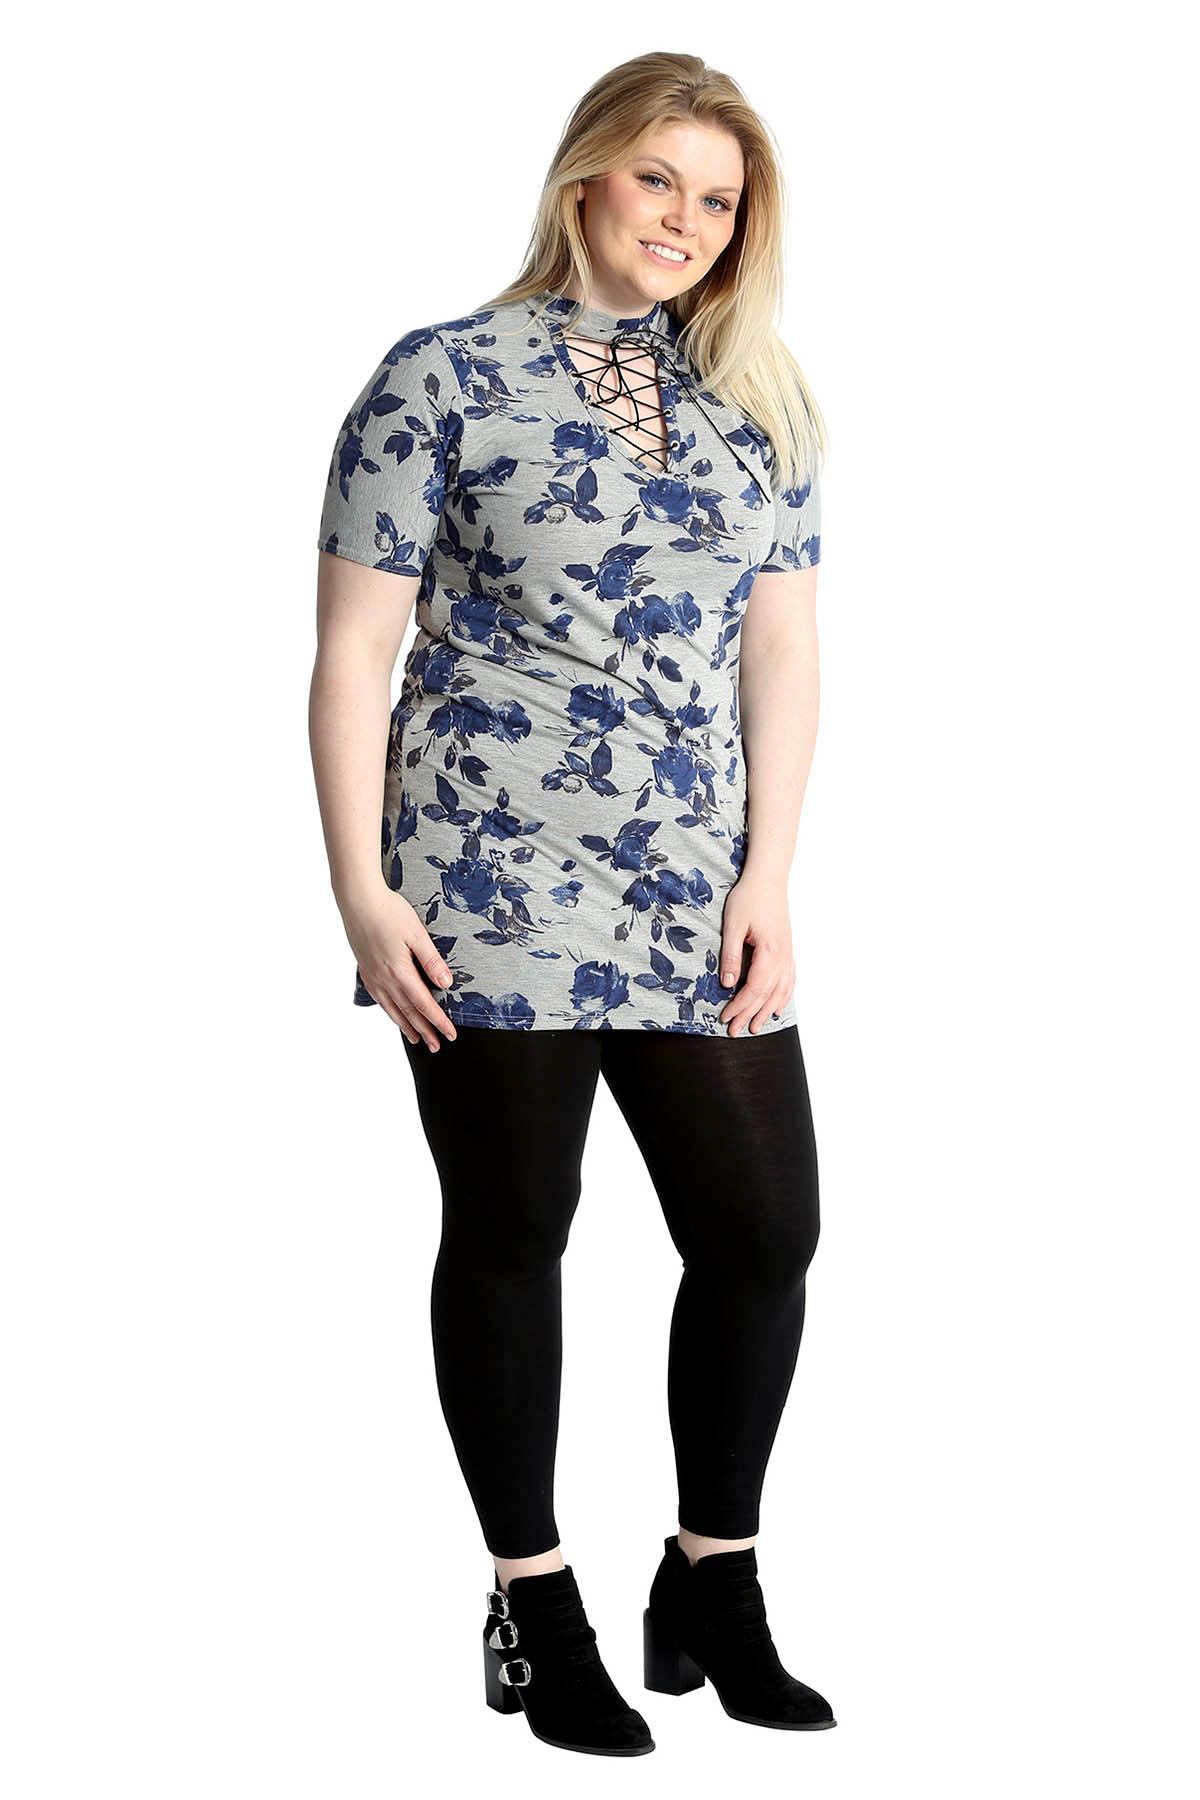 16510e98eab New Womens Plus Size Top Ladies T-Shirt Floral Print Eyelets Choker ...